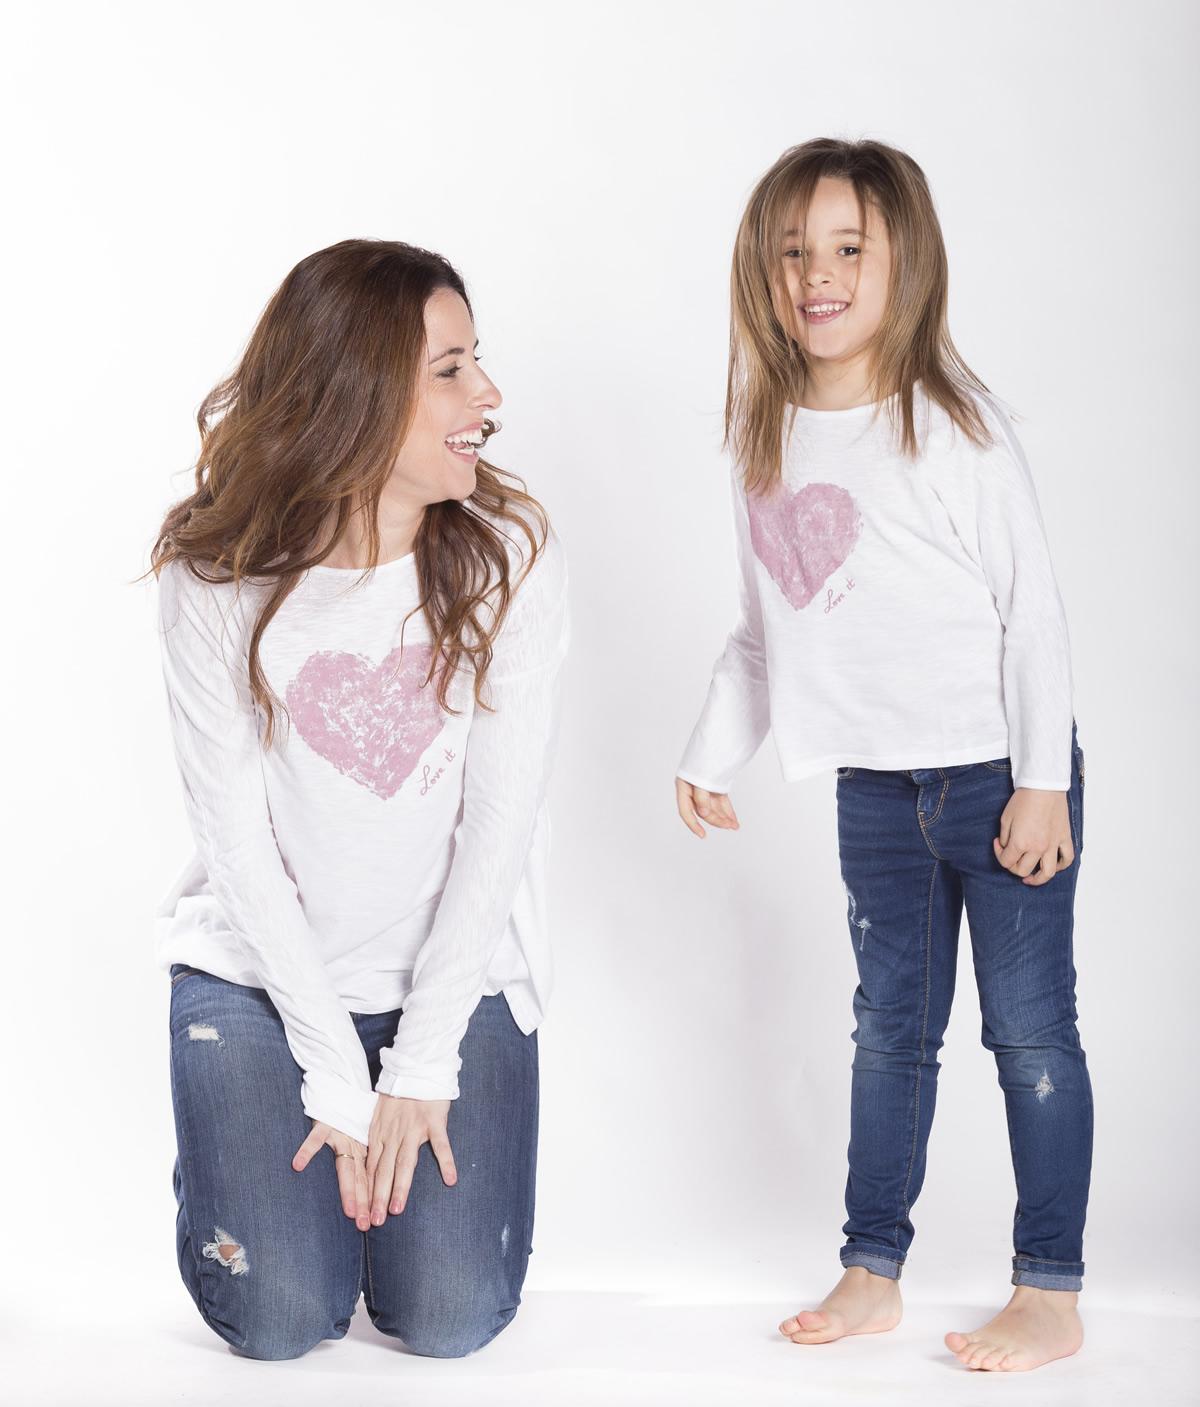 madre-hija-moda-loveitsara-kids-mon-fashion-jimena&me-jimena-descalzaporelparque